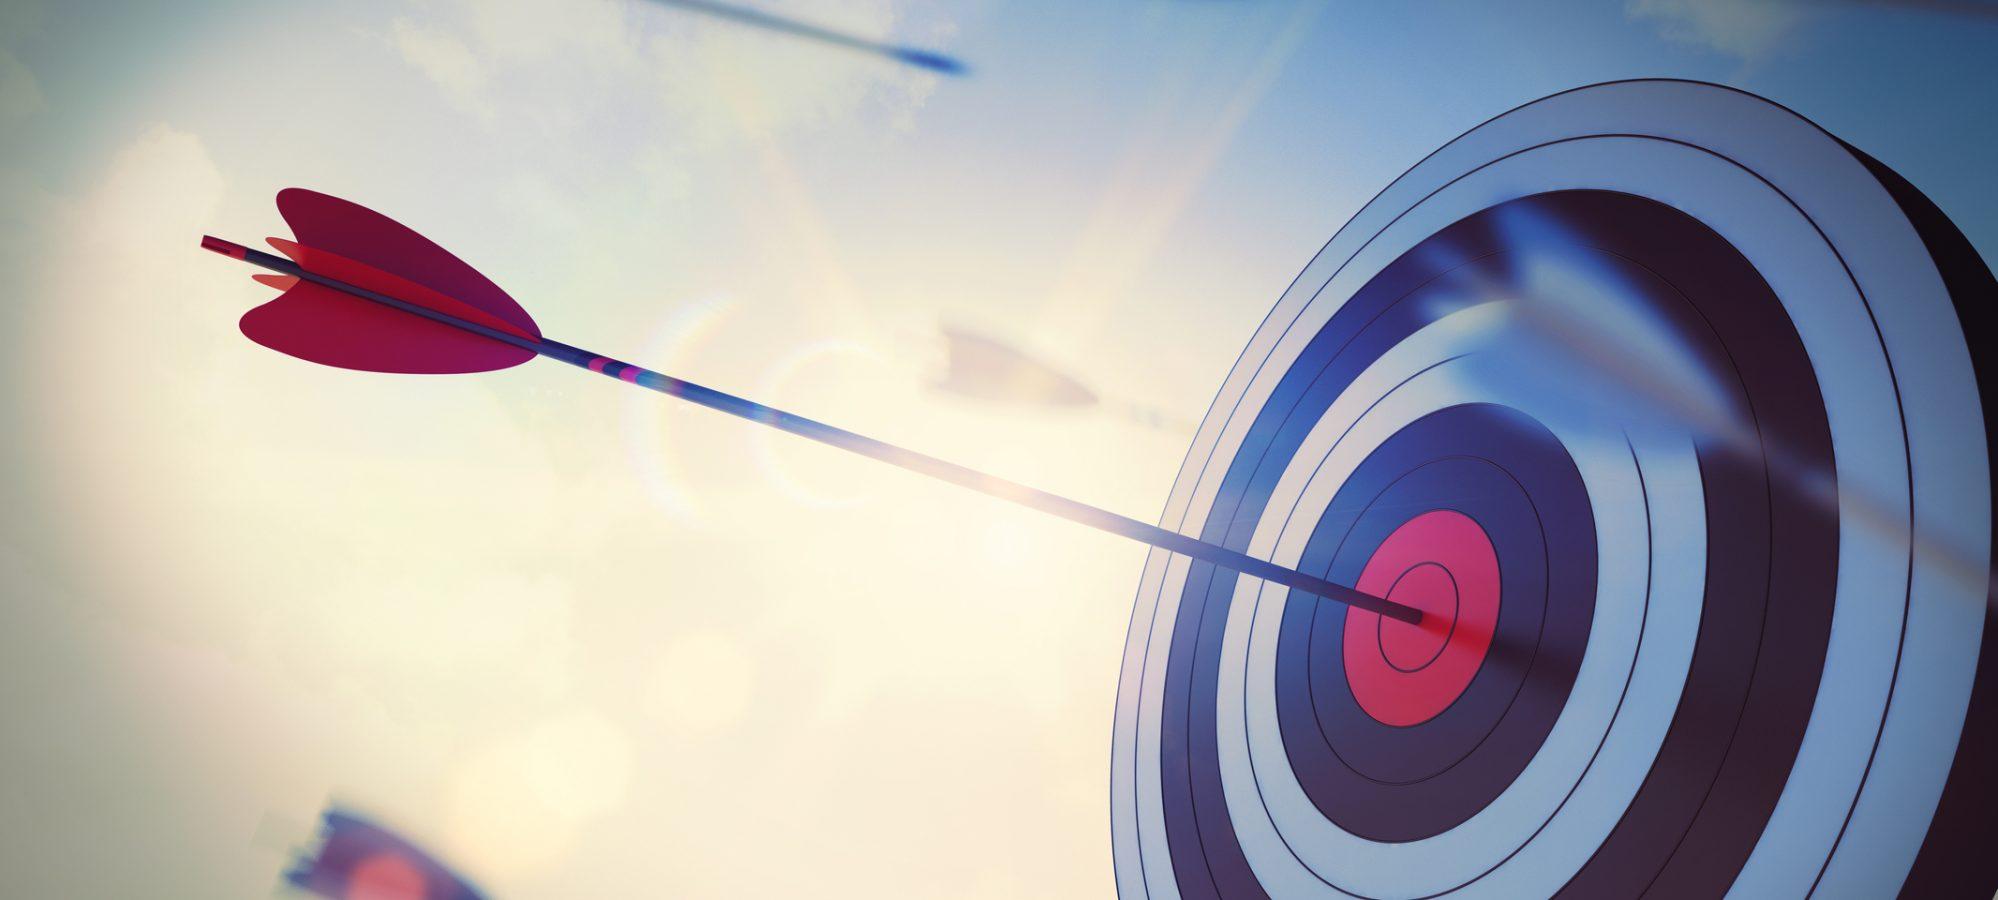 Image of arrow hitting center of target